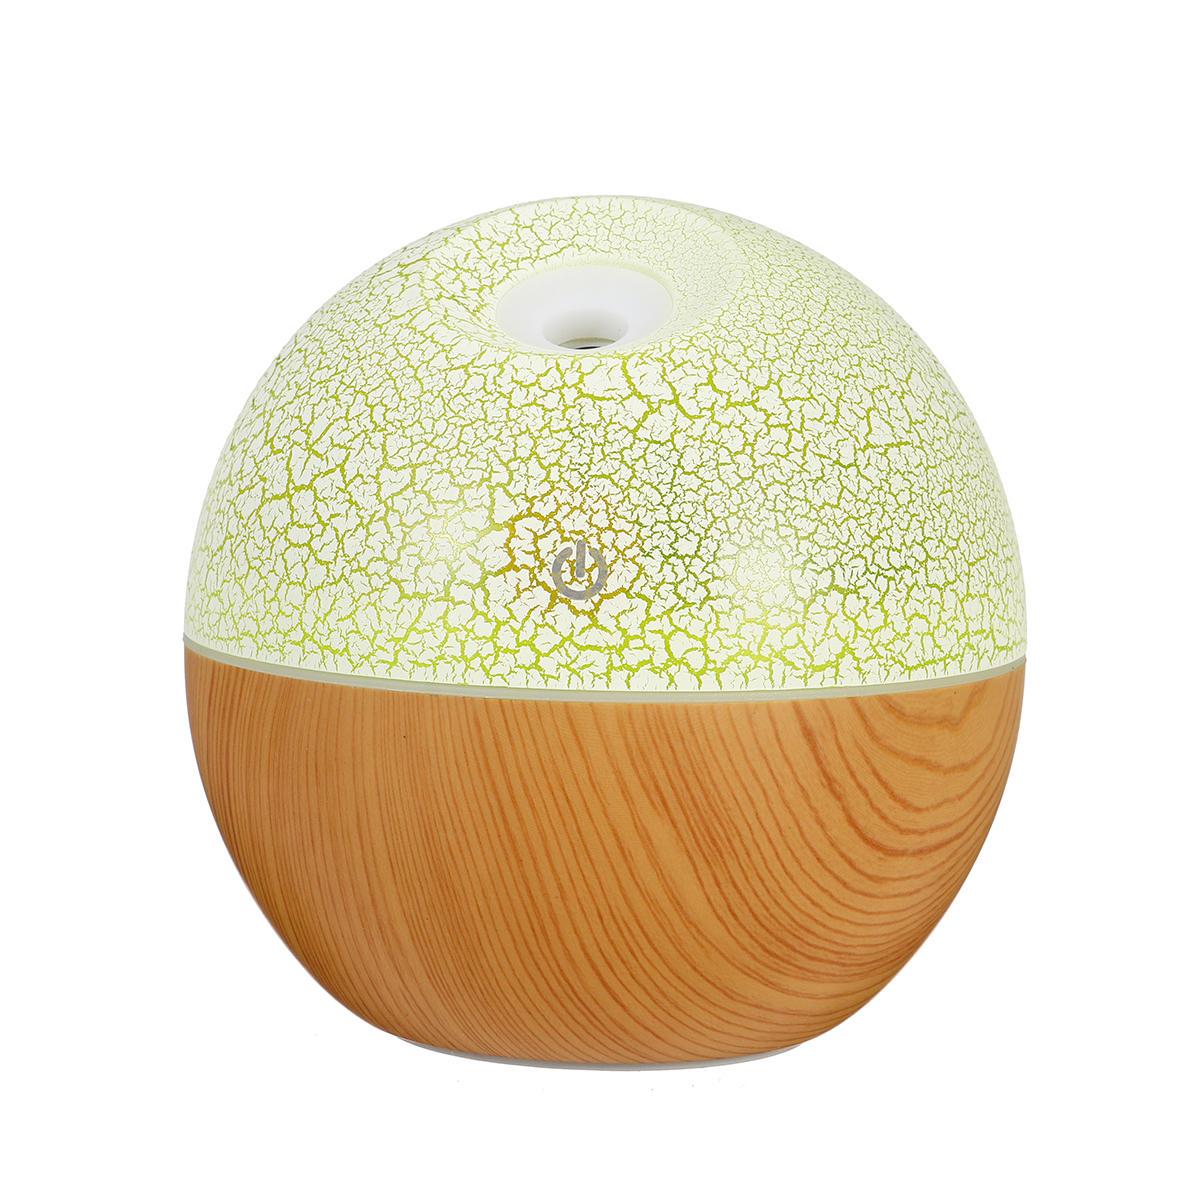 USB LED Aroma Ultrasuoni Umidificatore Aromaterapia Essential Olio Foschia Diffusore d'aria